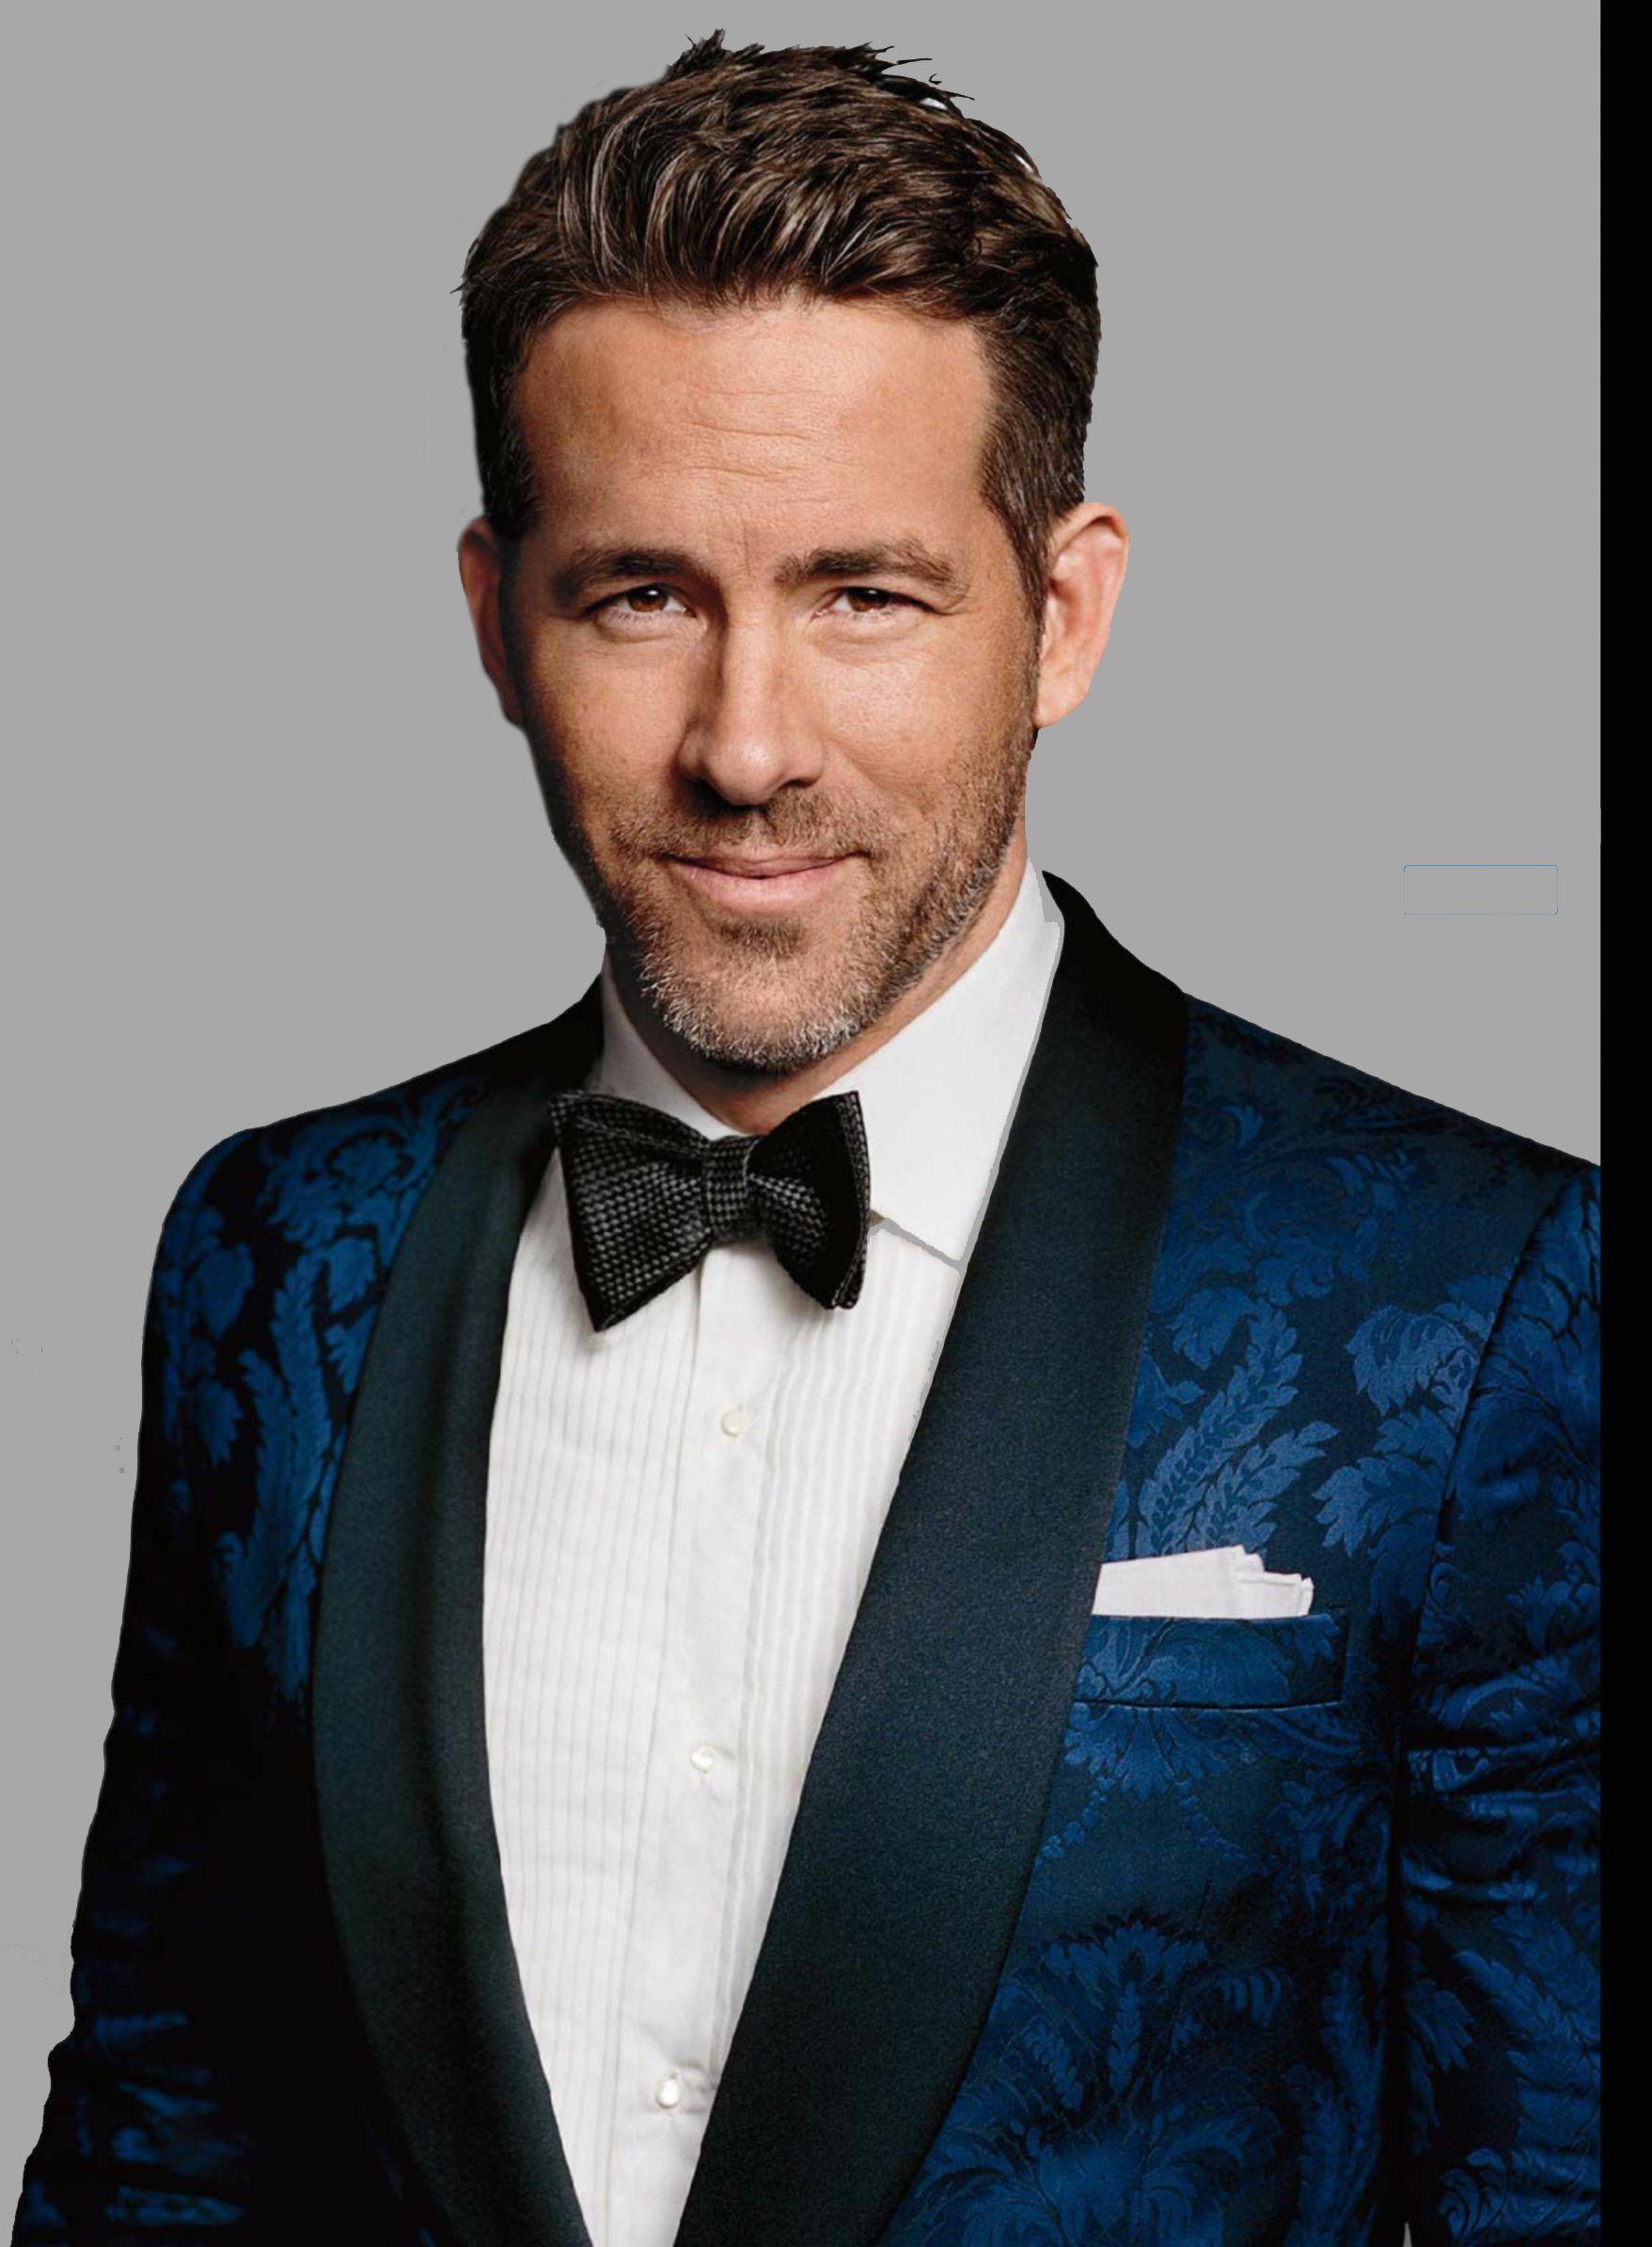 Ryan Reynolds Para Gq Usa Men Of The Year Issue In 2018 Ryan